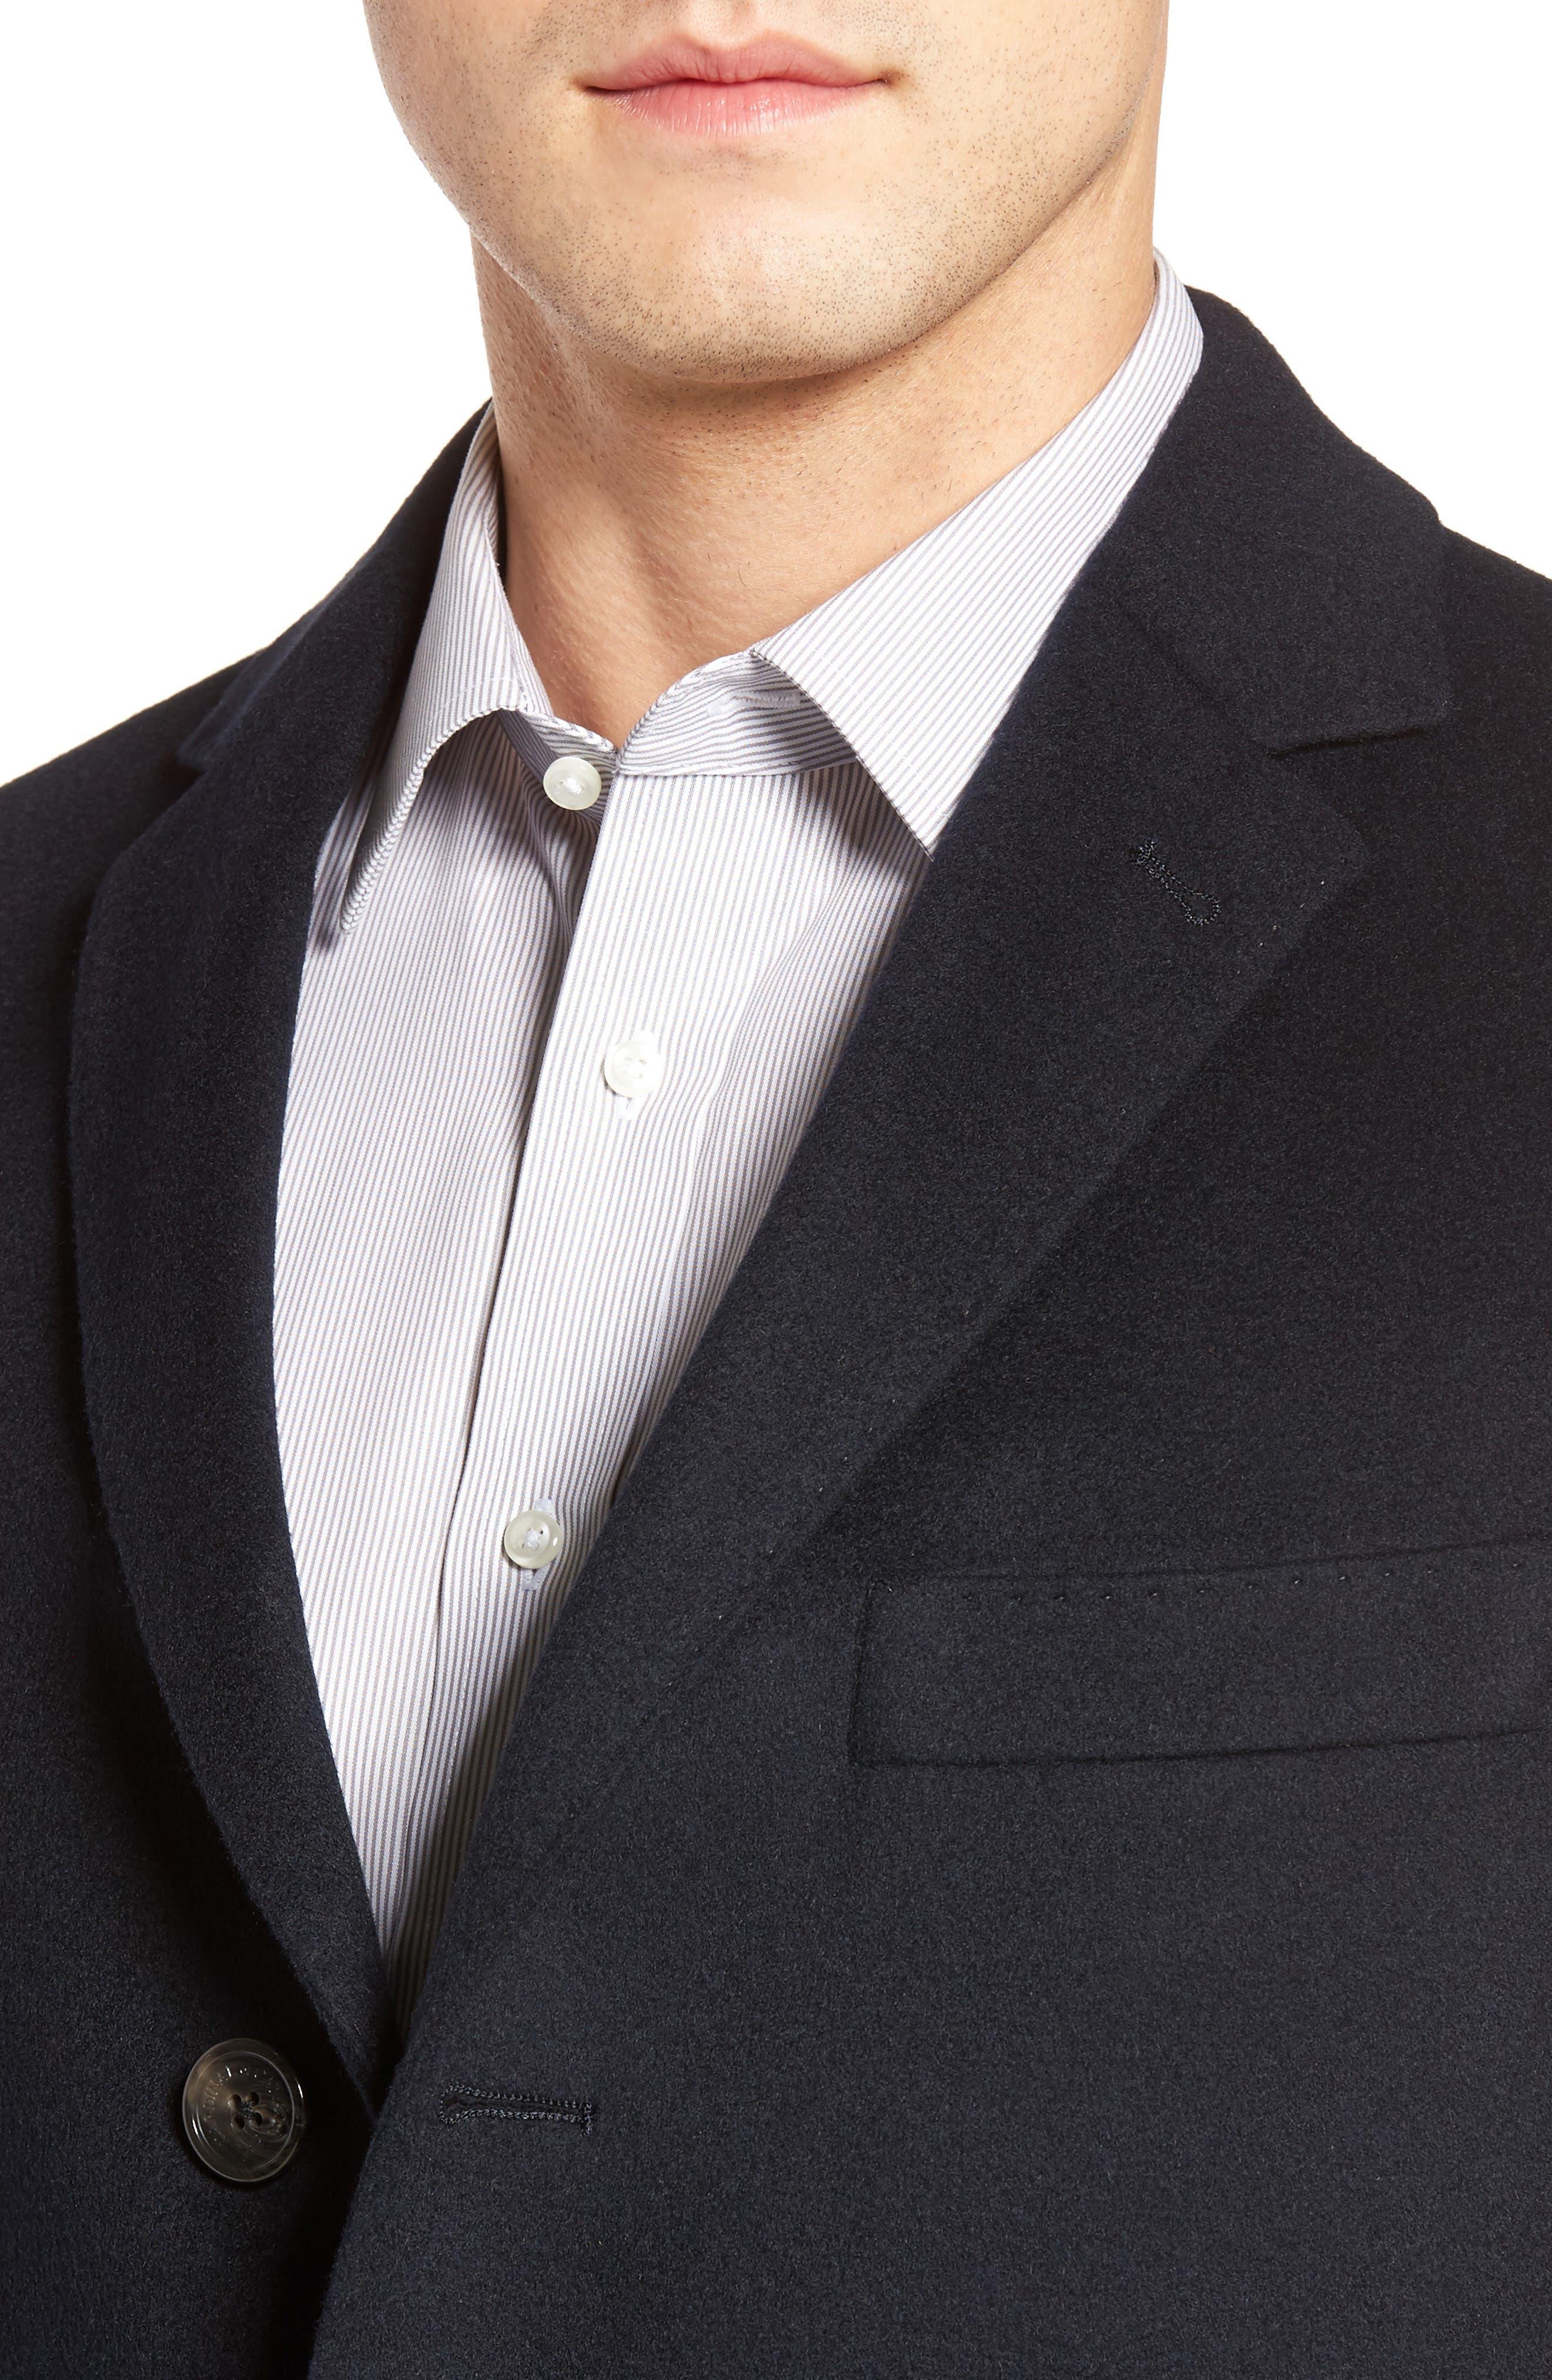 St. Paul Wool & Cashmere Topcoat,                             Alternate thumbnail 4, color,                             410